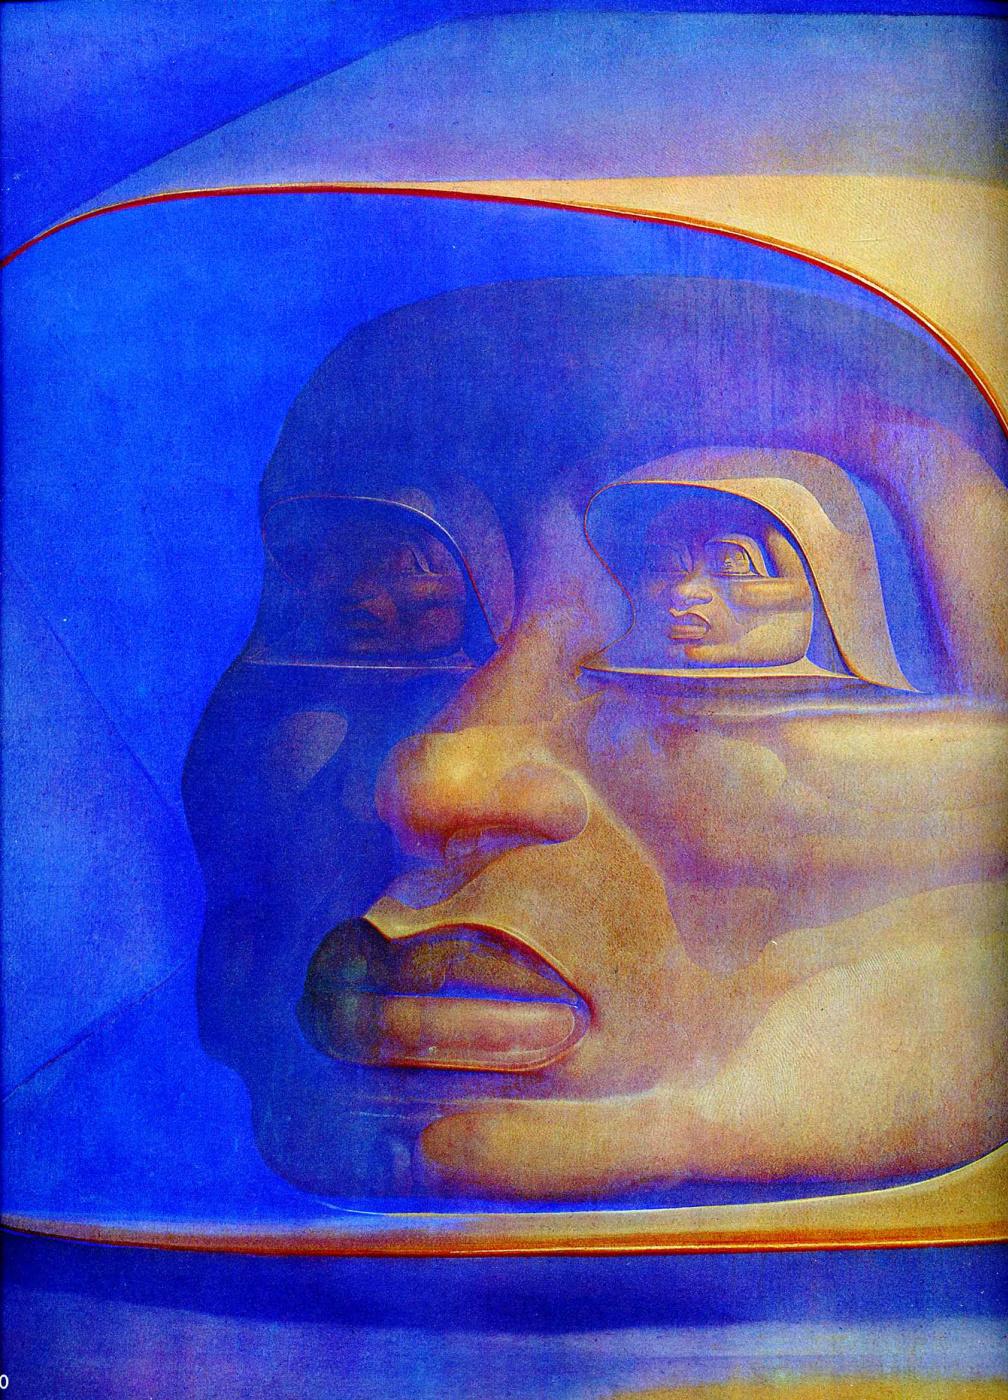 Ernst Fuchs. The observer in infinity